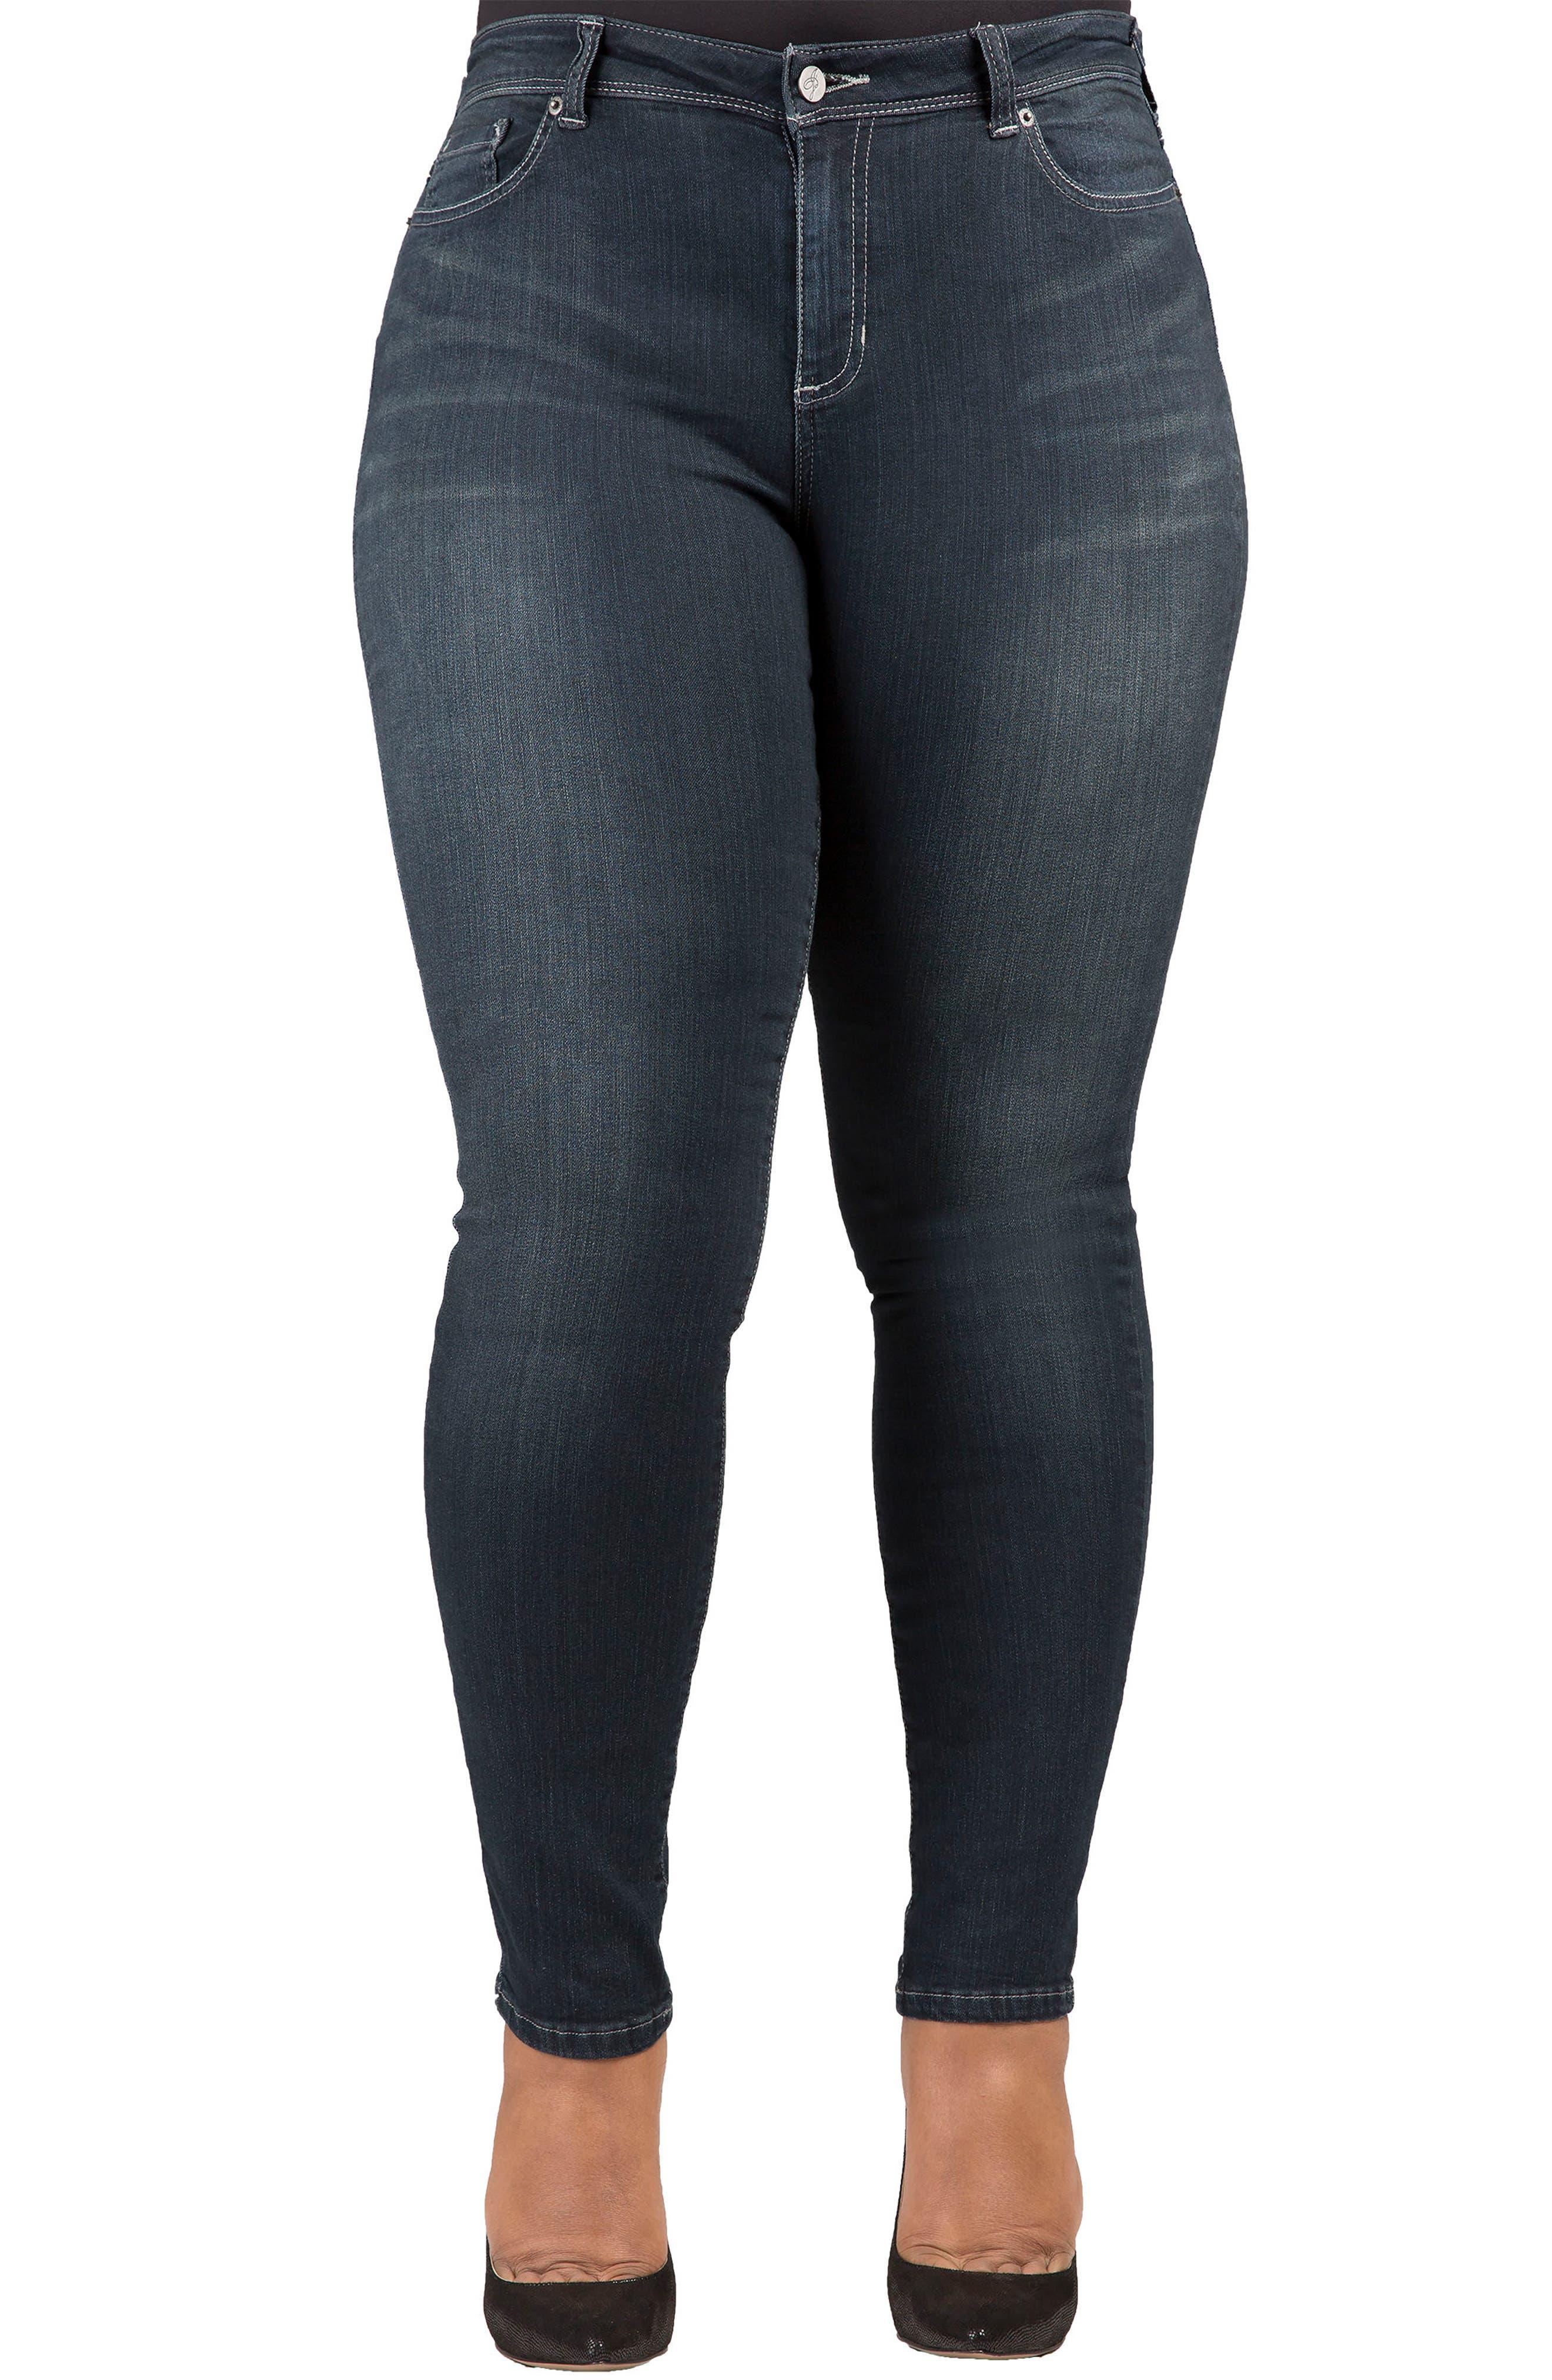 Poetic Justice 'Maya' Stretch Skinny Jeans (Dark Blue) (Plus Size)